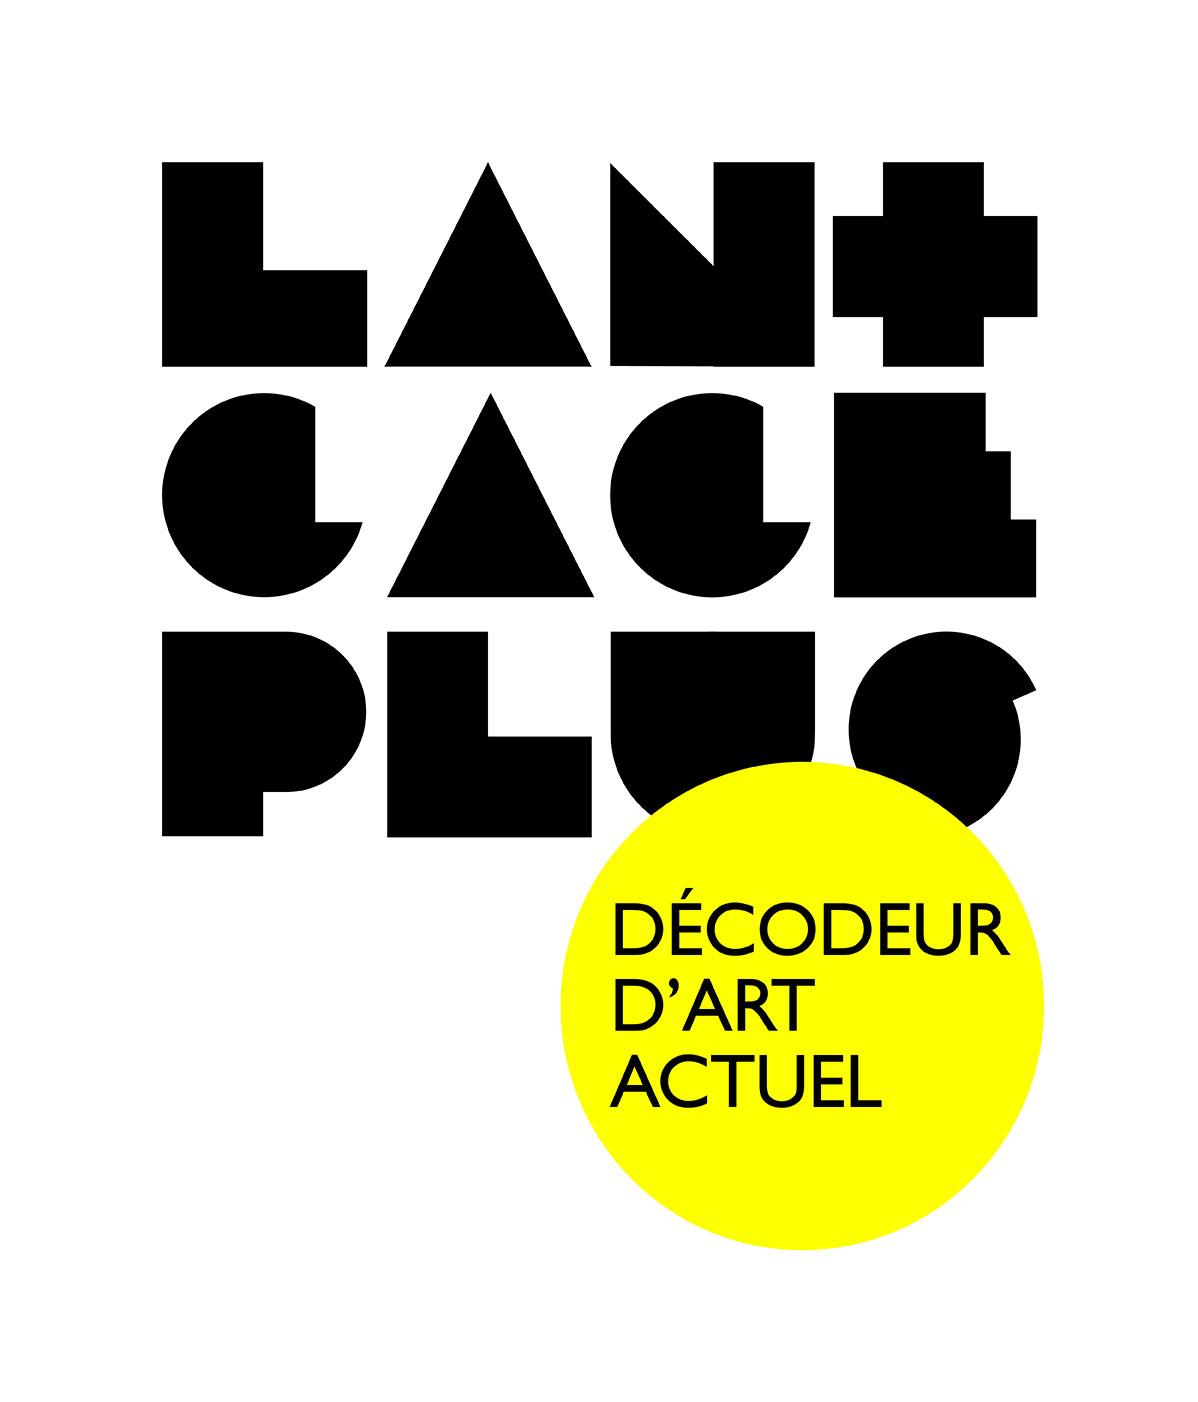 logo de Langage Plus